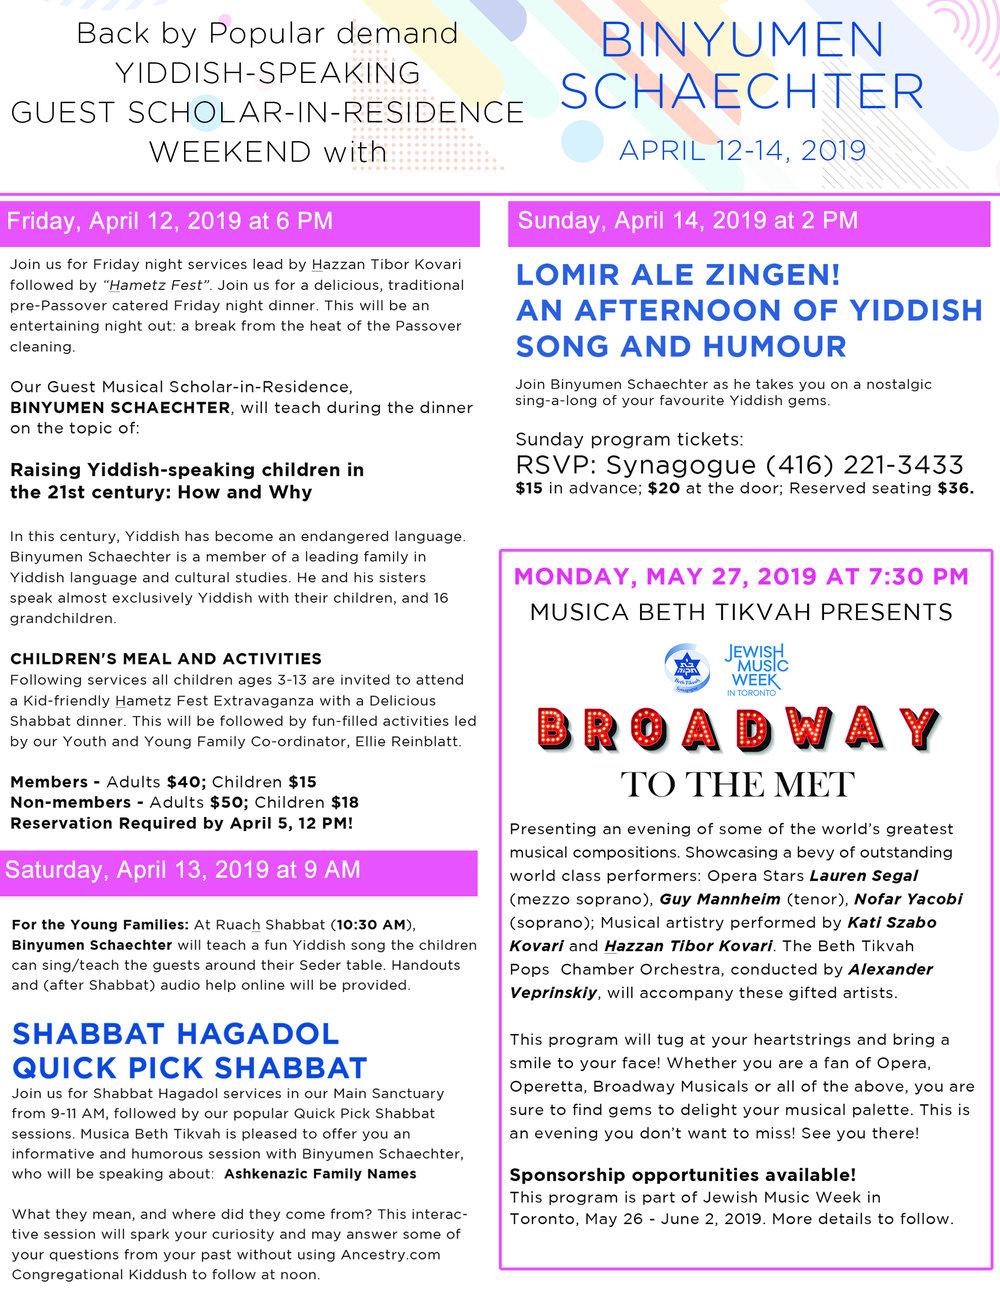 Musica April Programs .jpg